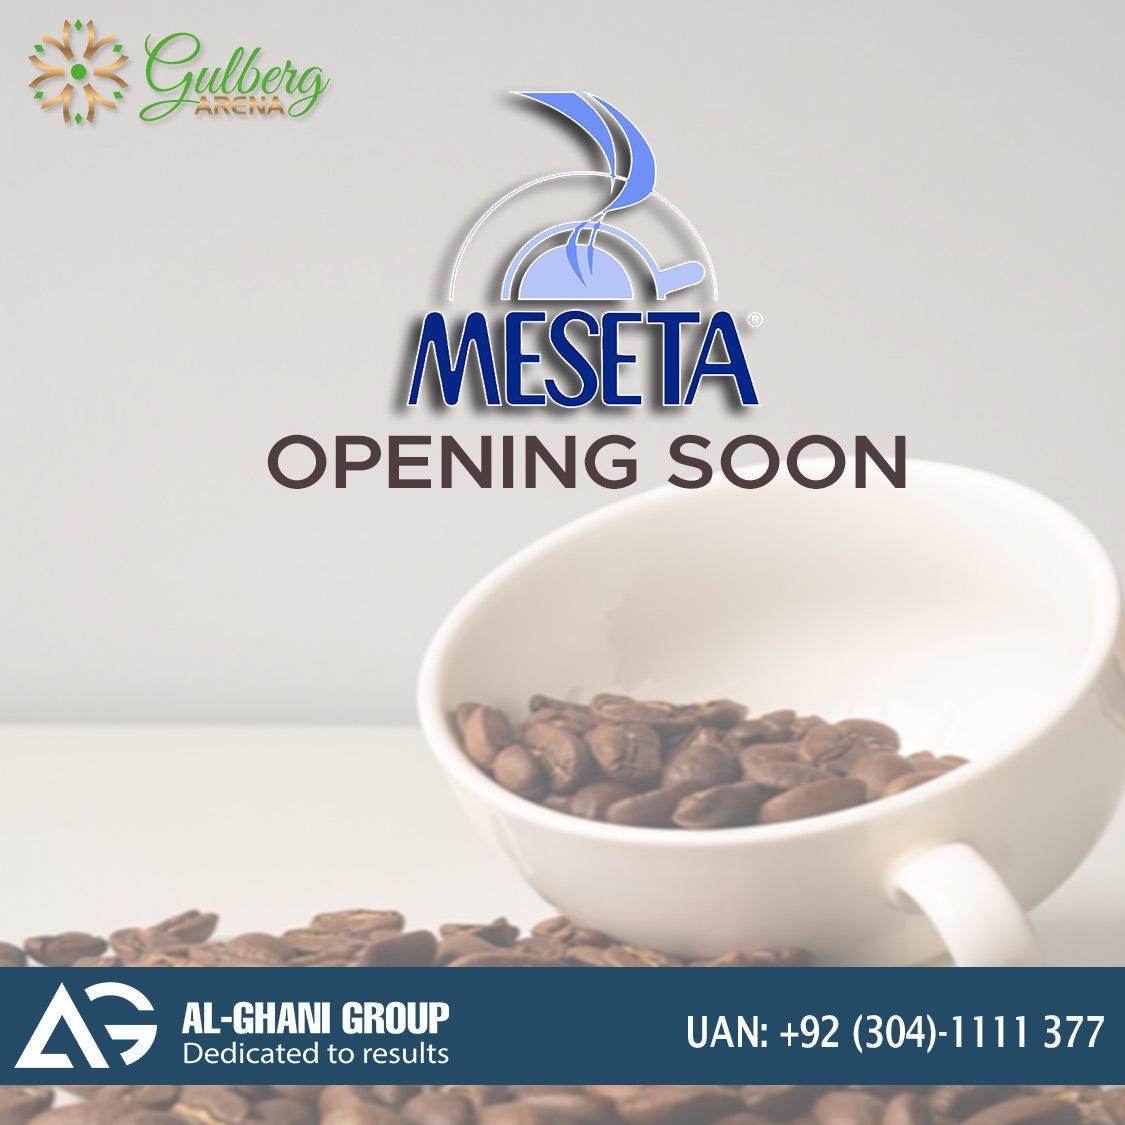 meseta coffee court in gulberg greens, gulberg arena mall islamabad